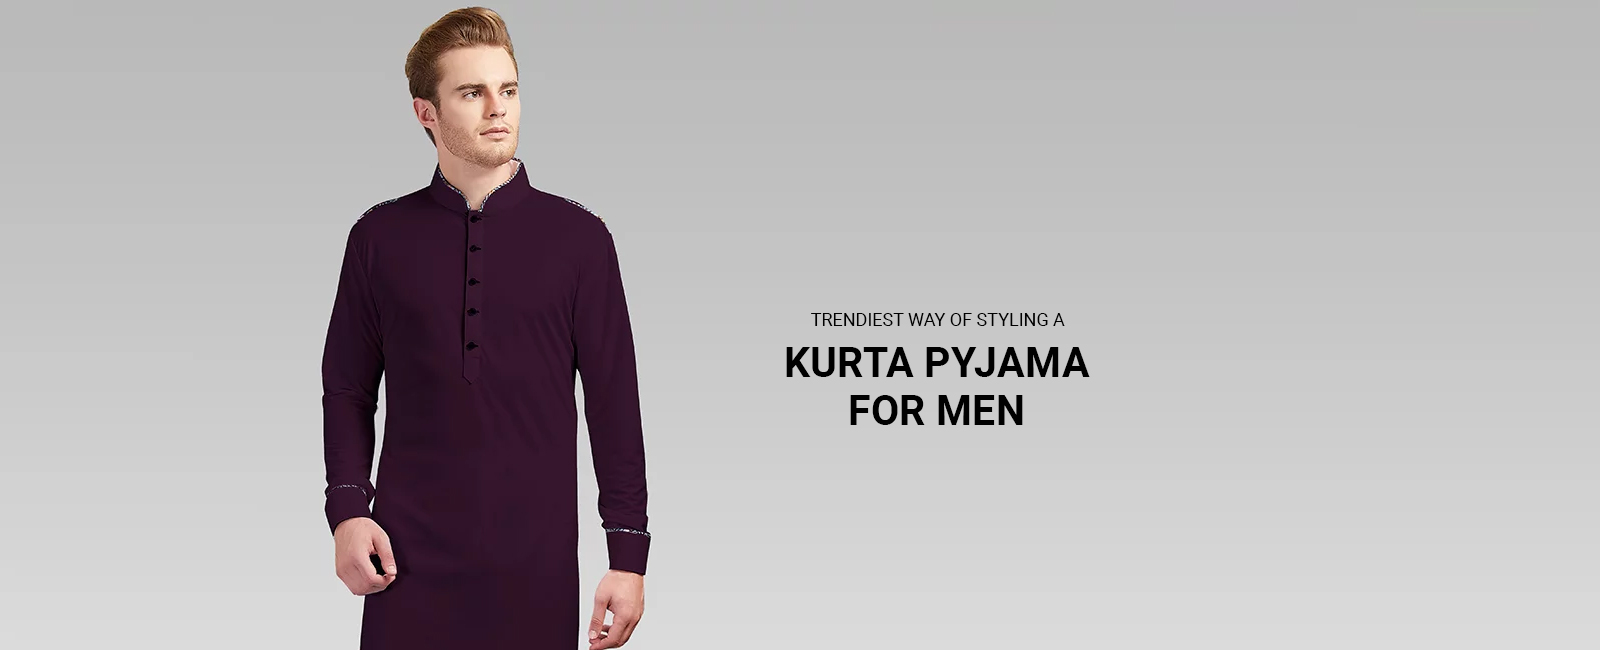 Trendiest way of Styling a Kurta Pyjama for Men